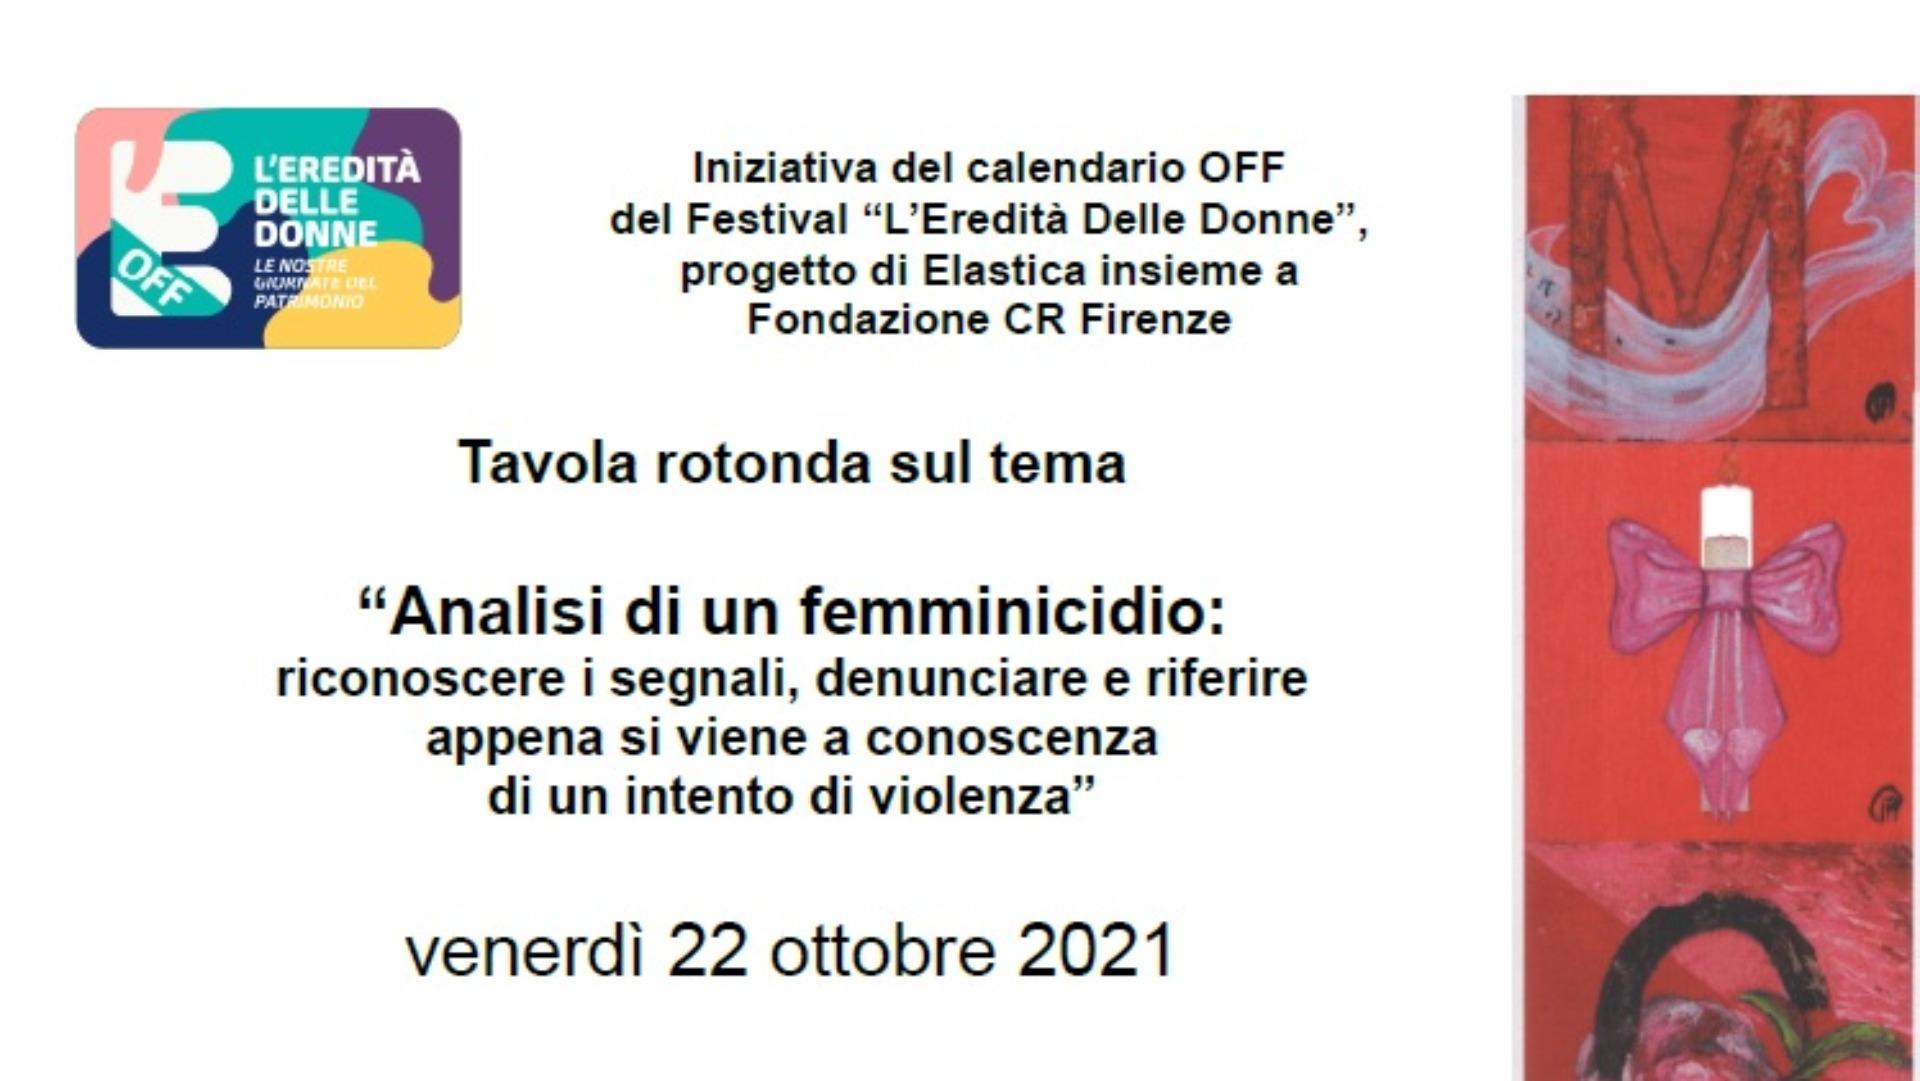 Firenze. Analisi di un femminicidio